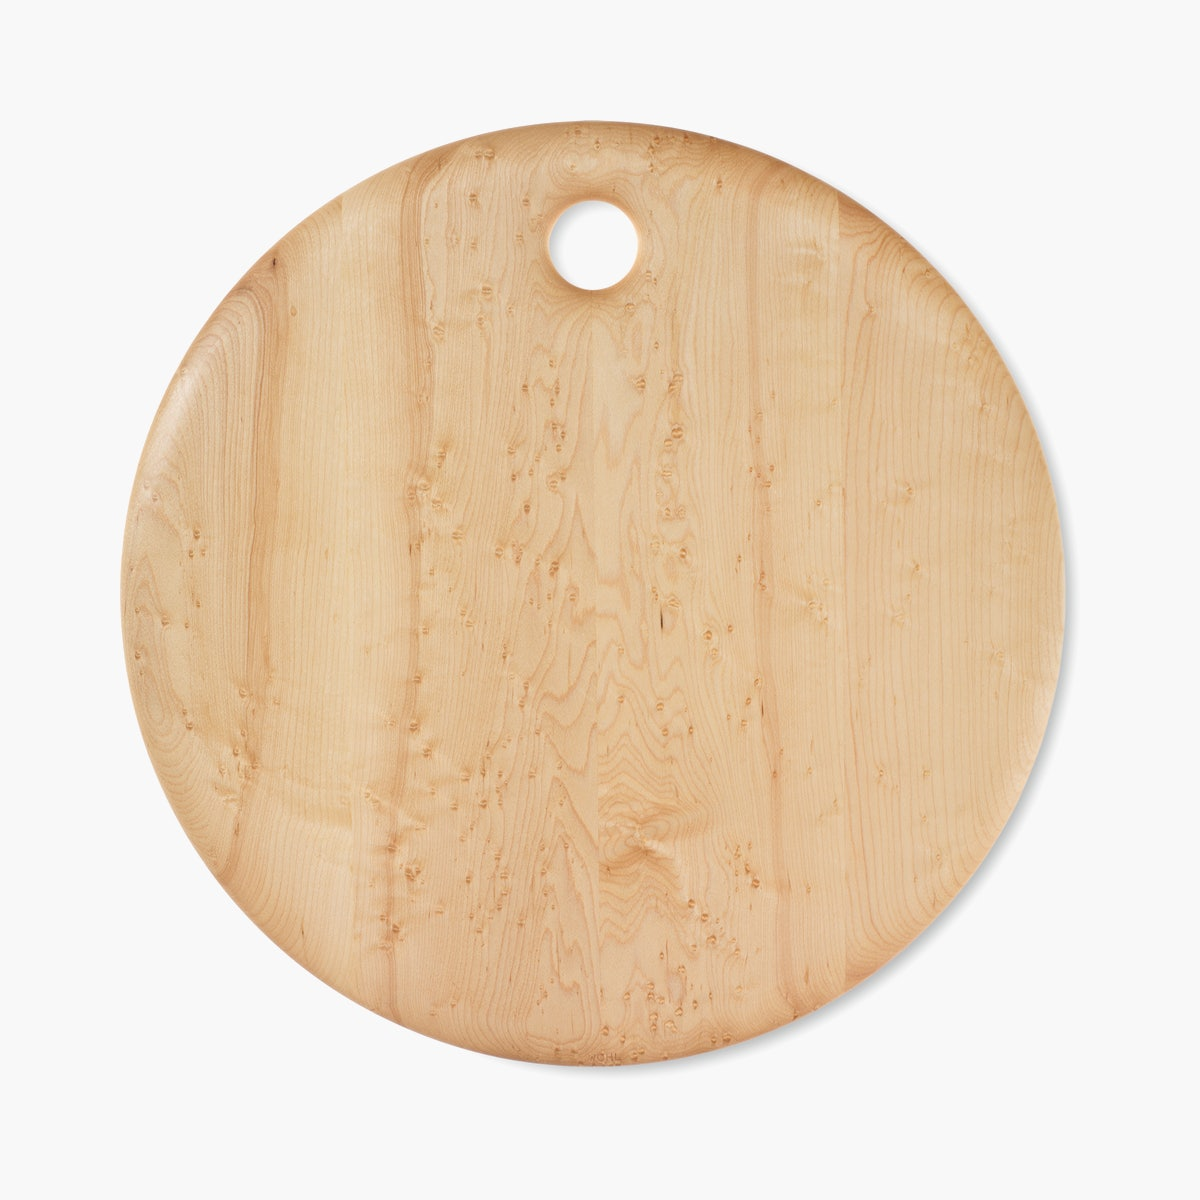 Edward Wohl Cutting Boards, Large Round